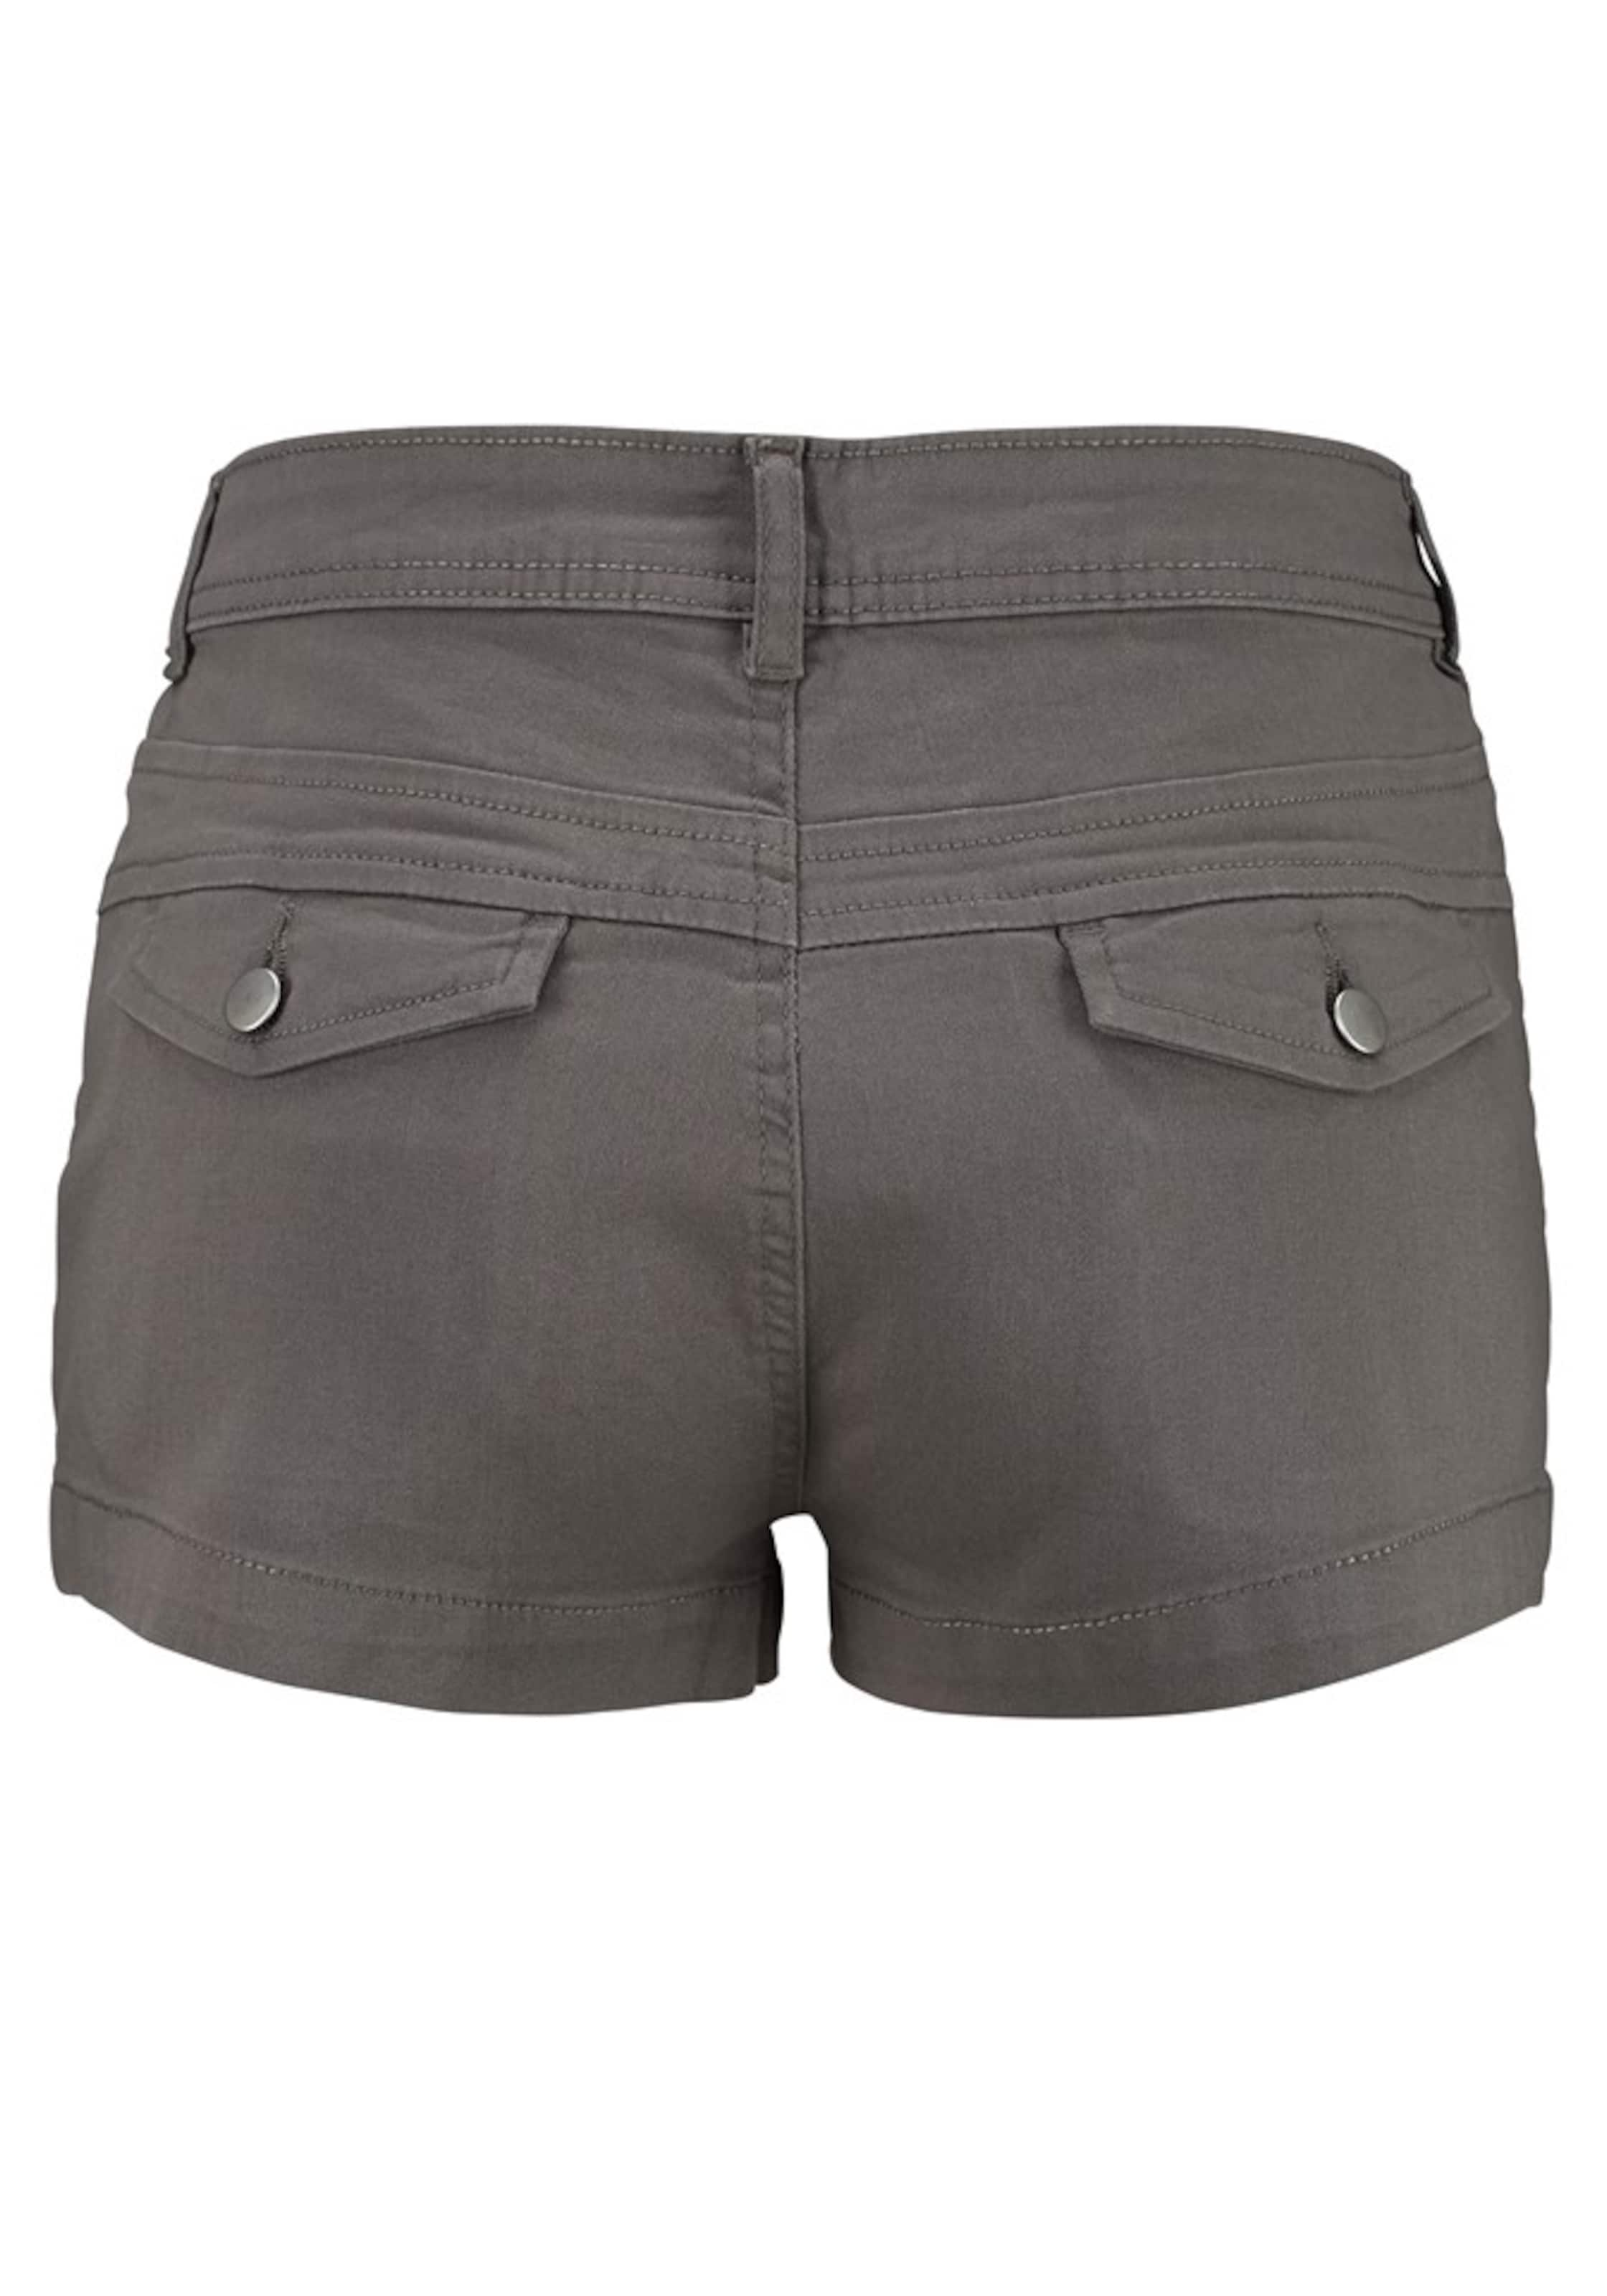 Lascana Lascana GrauKhaki In Hotpants Hotpants MzqSVGLUp